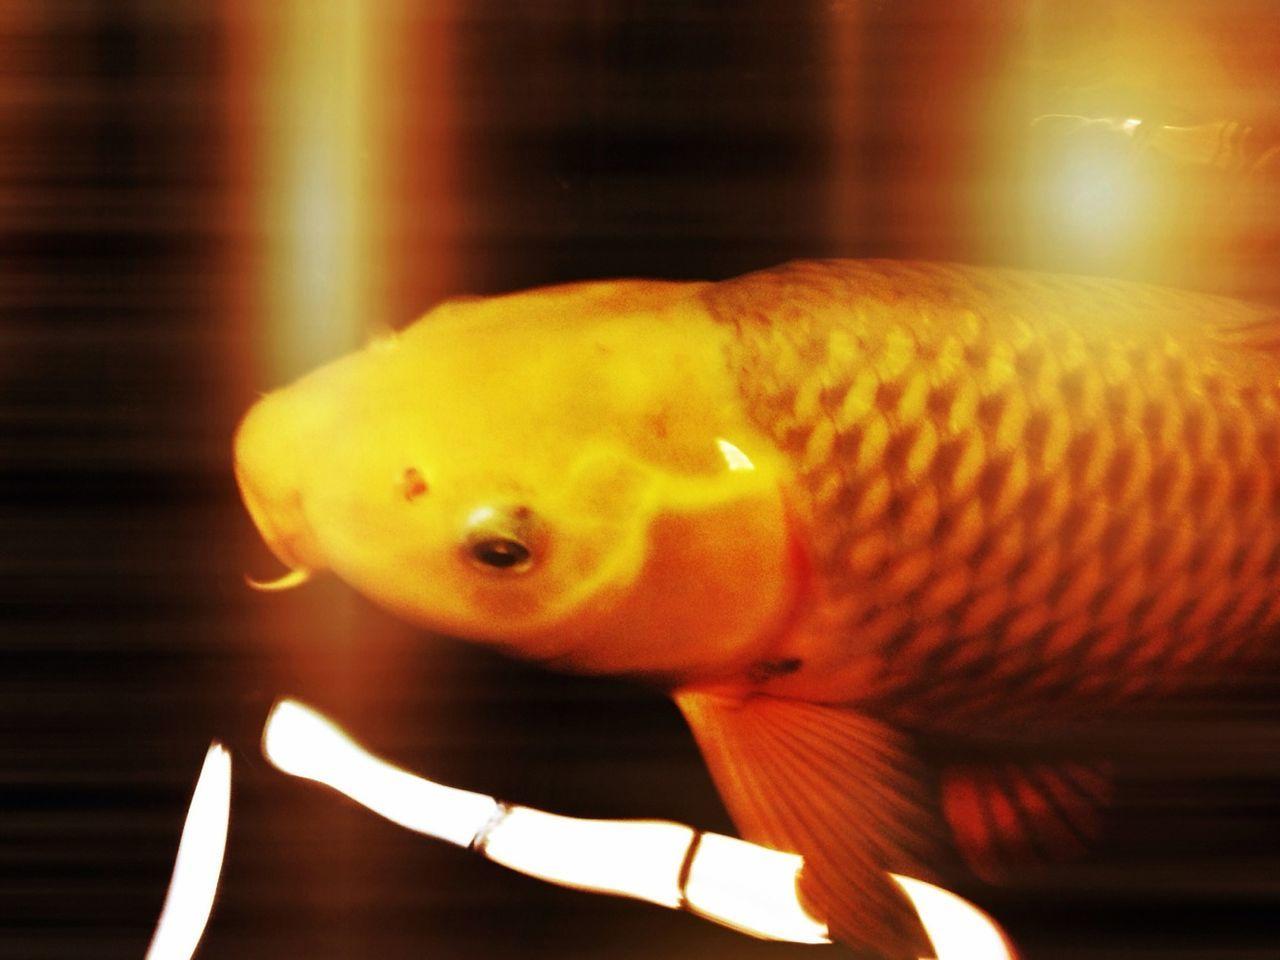 Close-up orange fish swimming